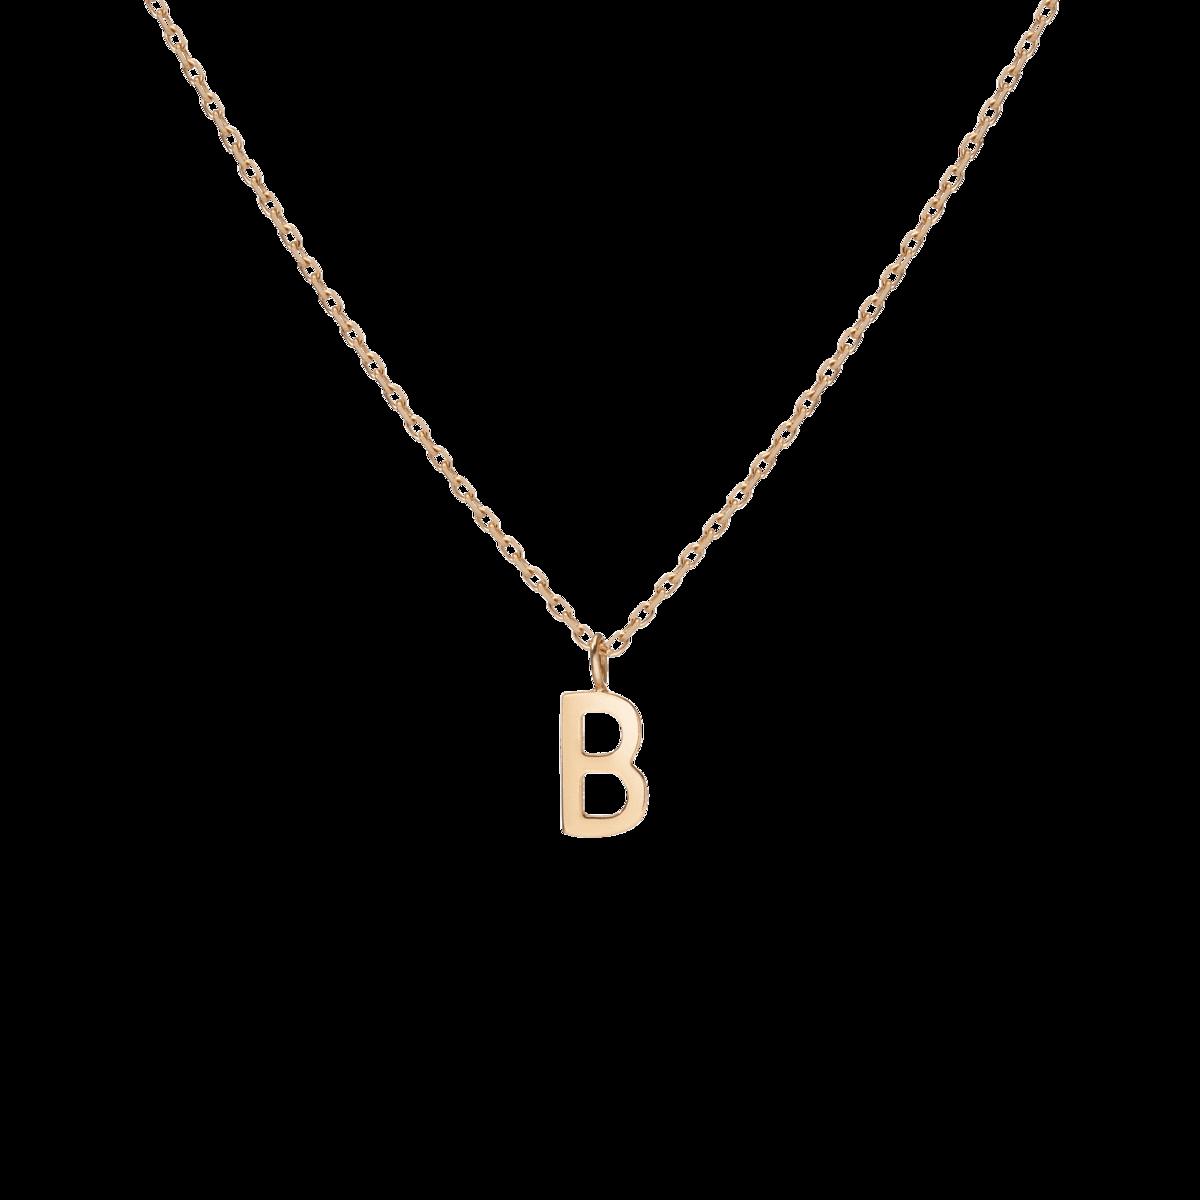 Aurate Mini Gold Letter Charm Pendant